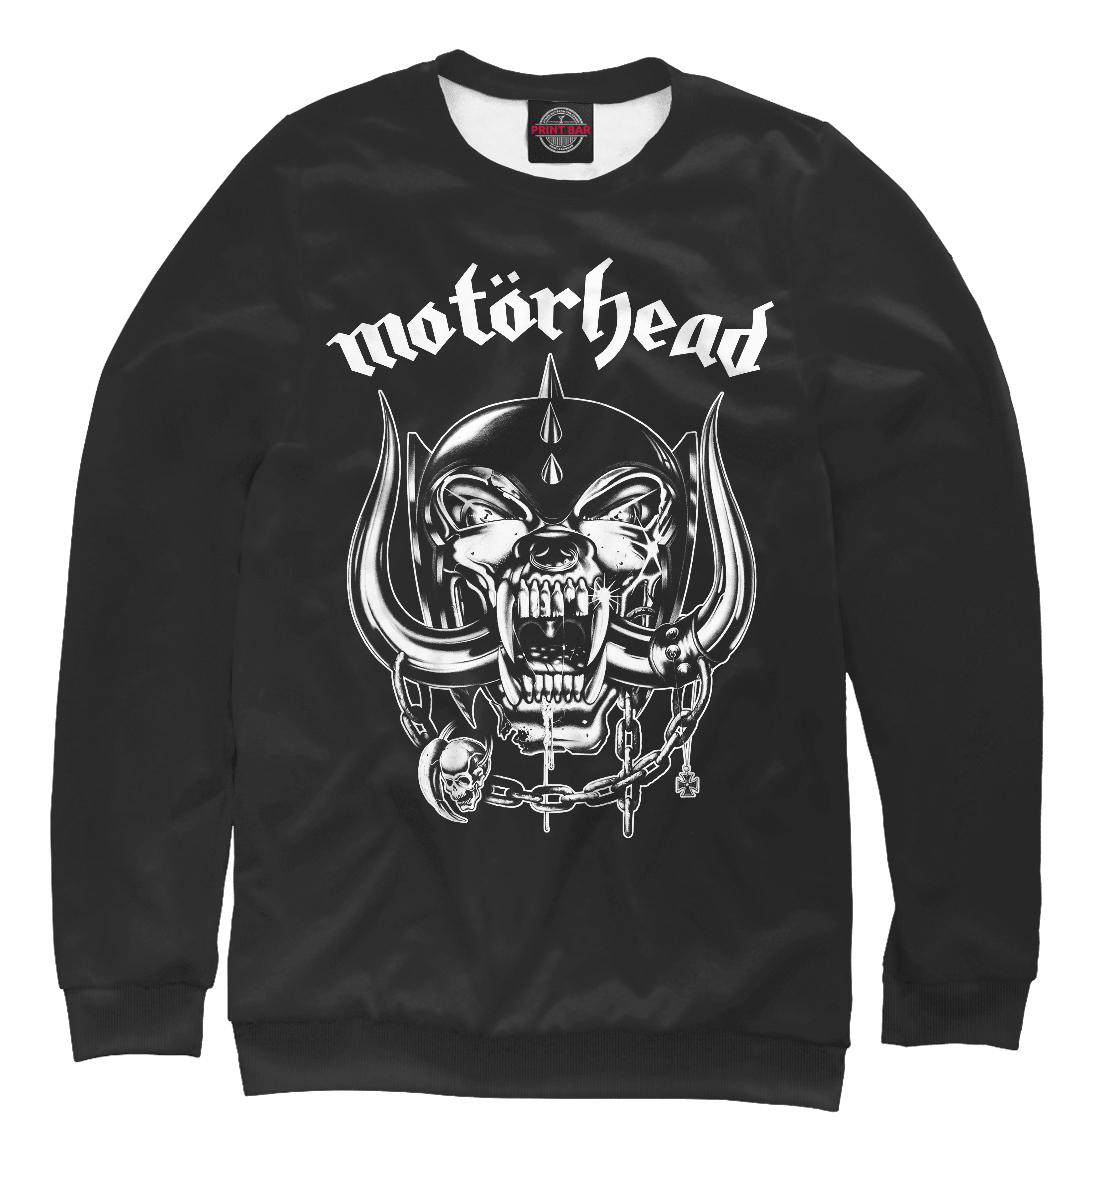 Купить Motorhead, Printbar, Свитшоты, MOT-979085-swi-1